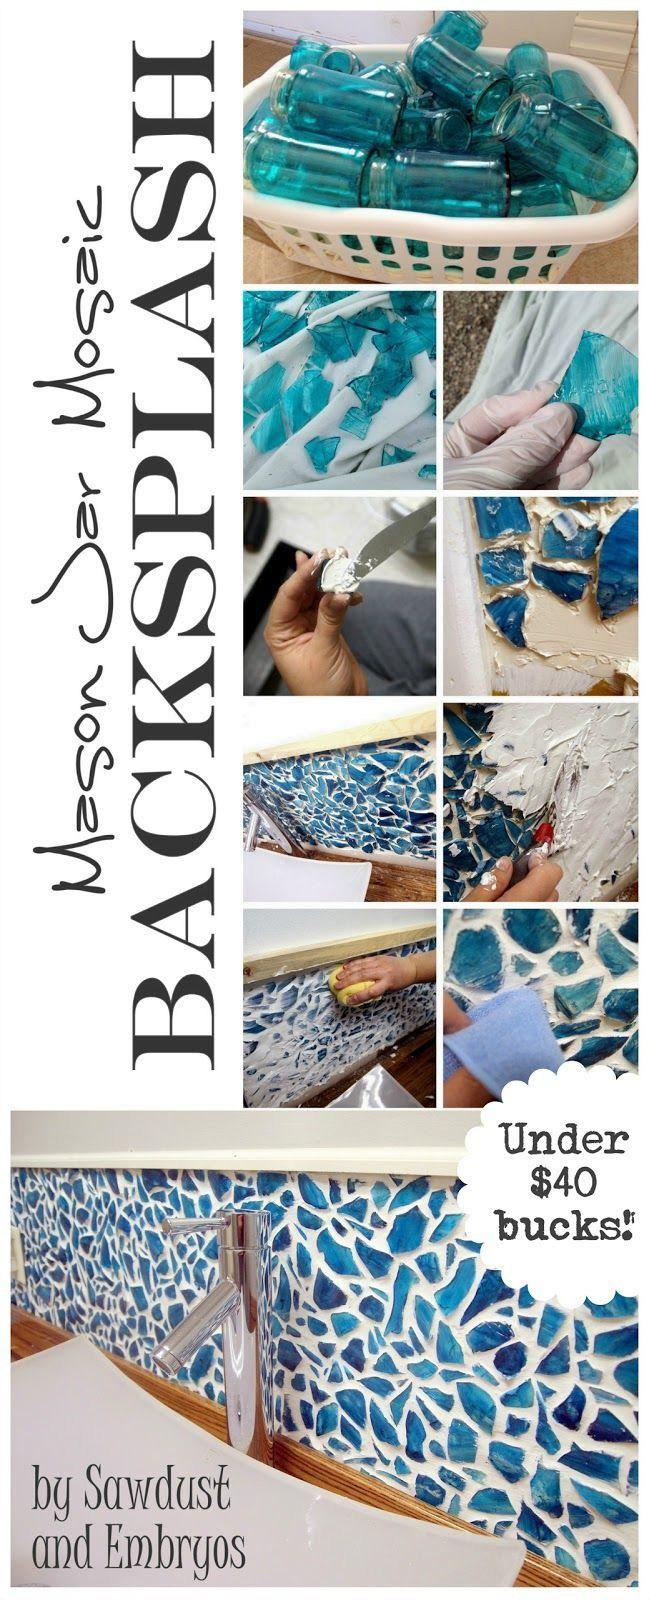 DIY Mason Jar Kitchen Backsplash. Glass dye the inside of mason jars. Smash the jars to create glass 'tiles'. Attach the tiles to your wall. Voila!